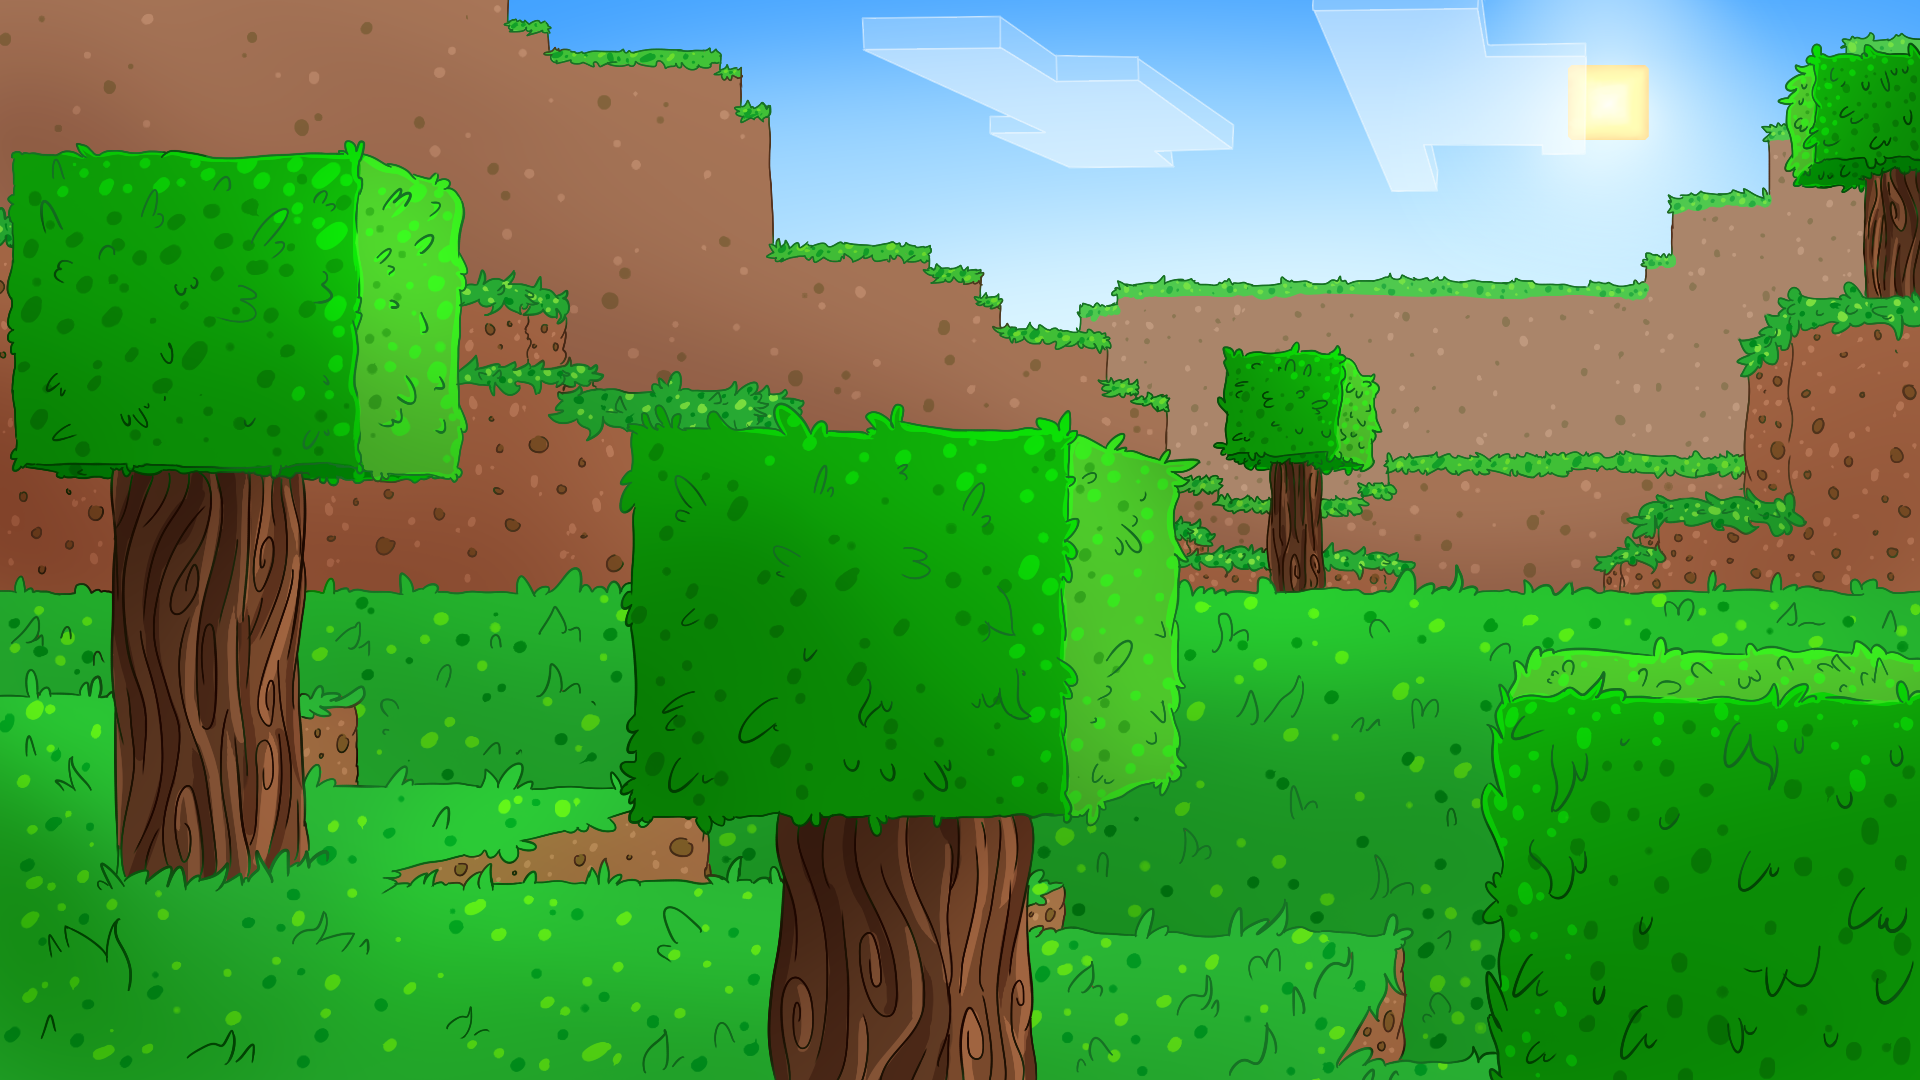 Top Wallpaper Minecraft Art - 93f2165840b80ca73053a5c14eb2b753-d9p3lde  Gallery_30685.png